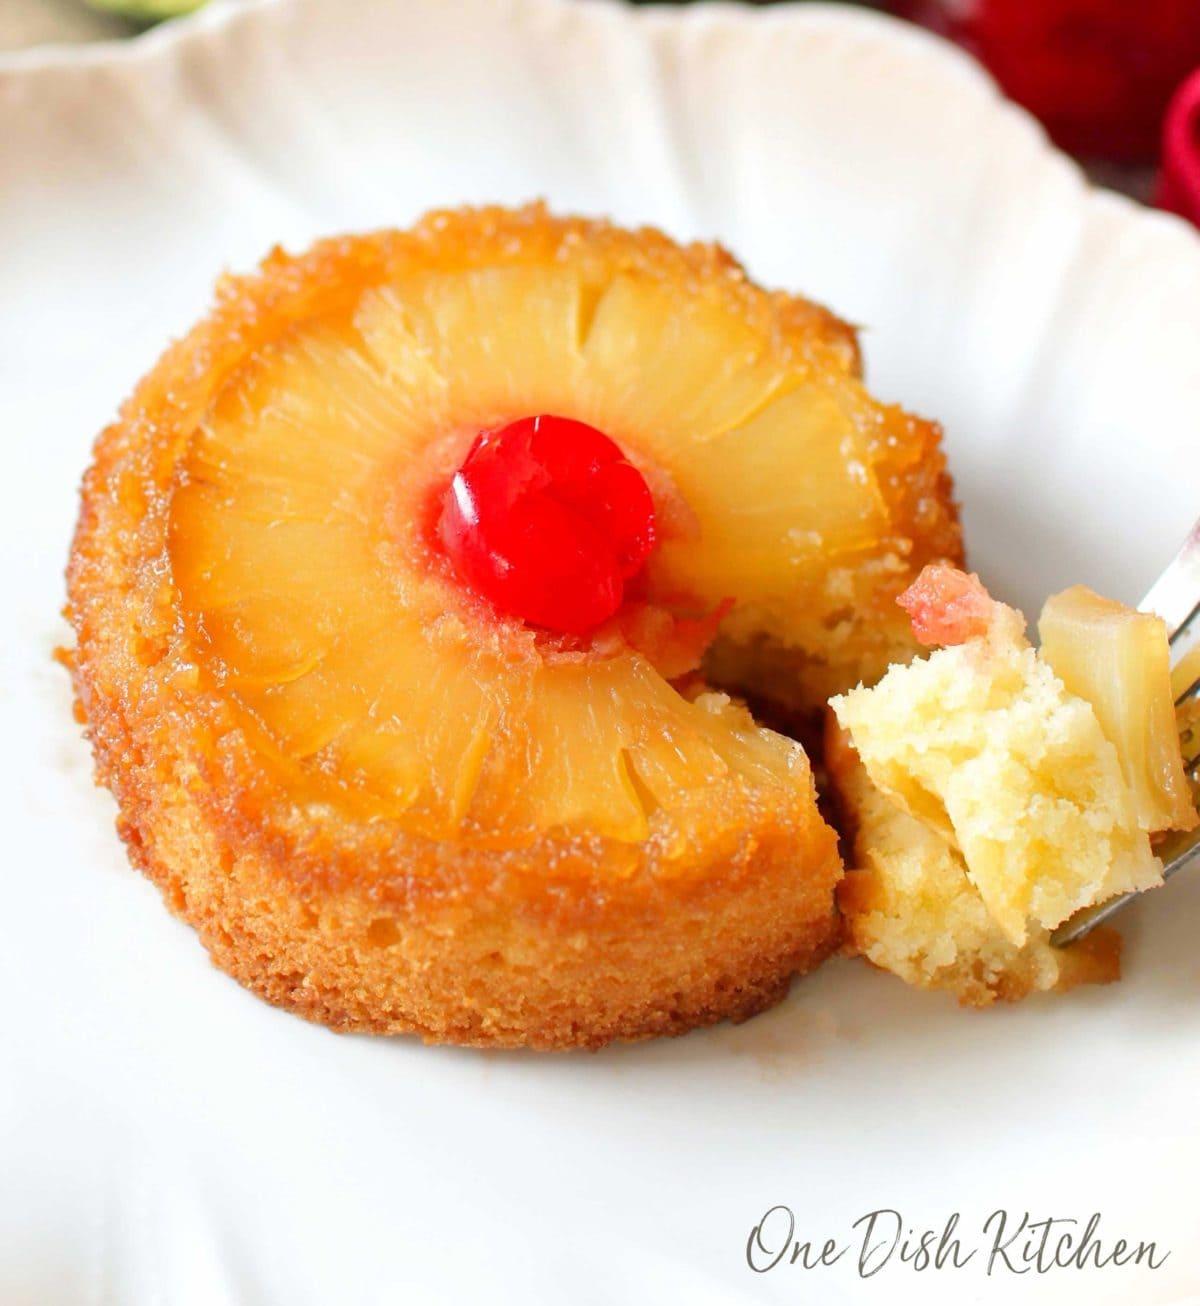 a closeup of a partially eaten pineapple upside down cake.